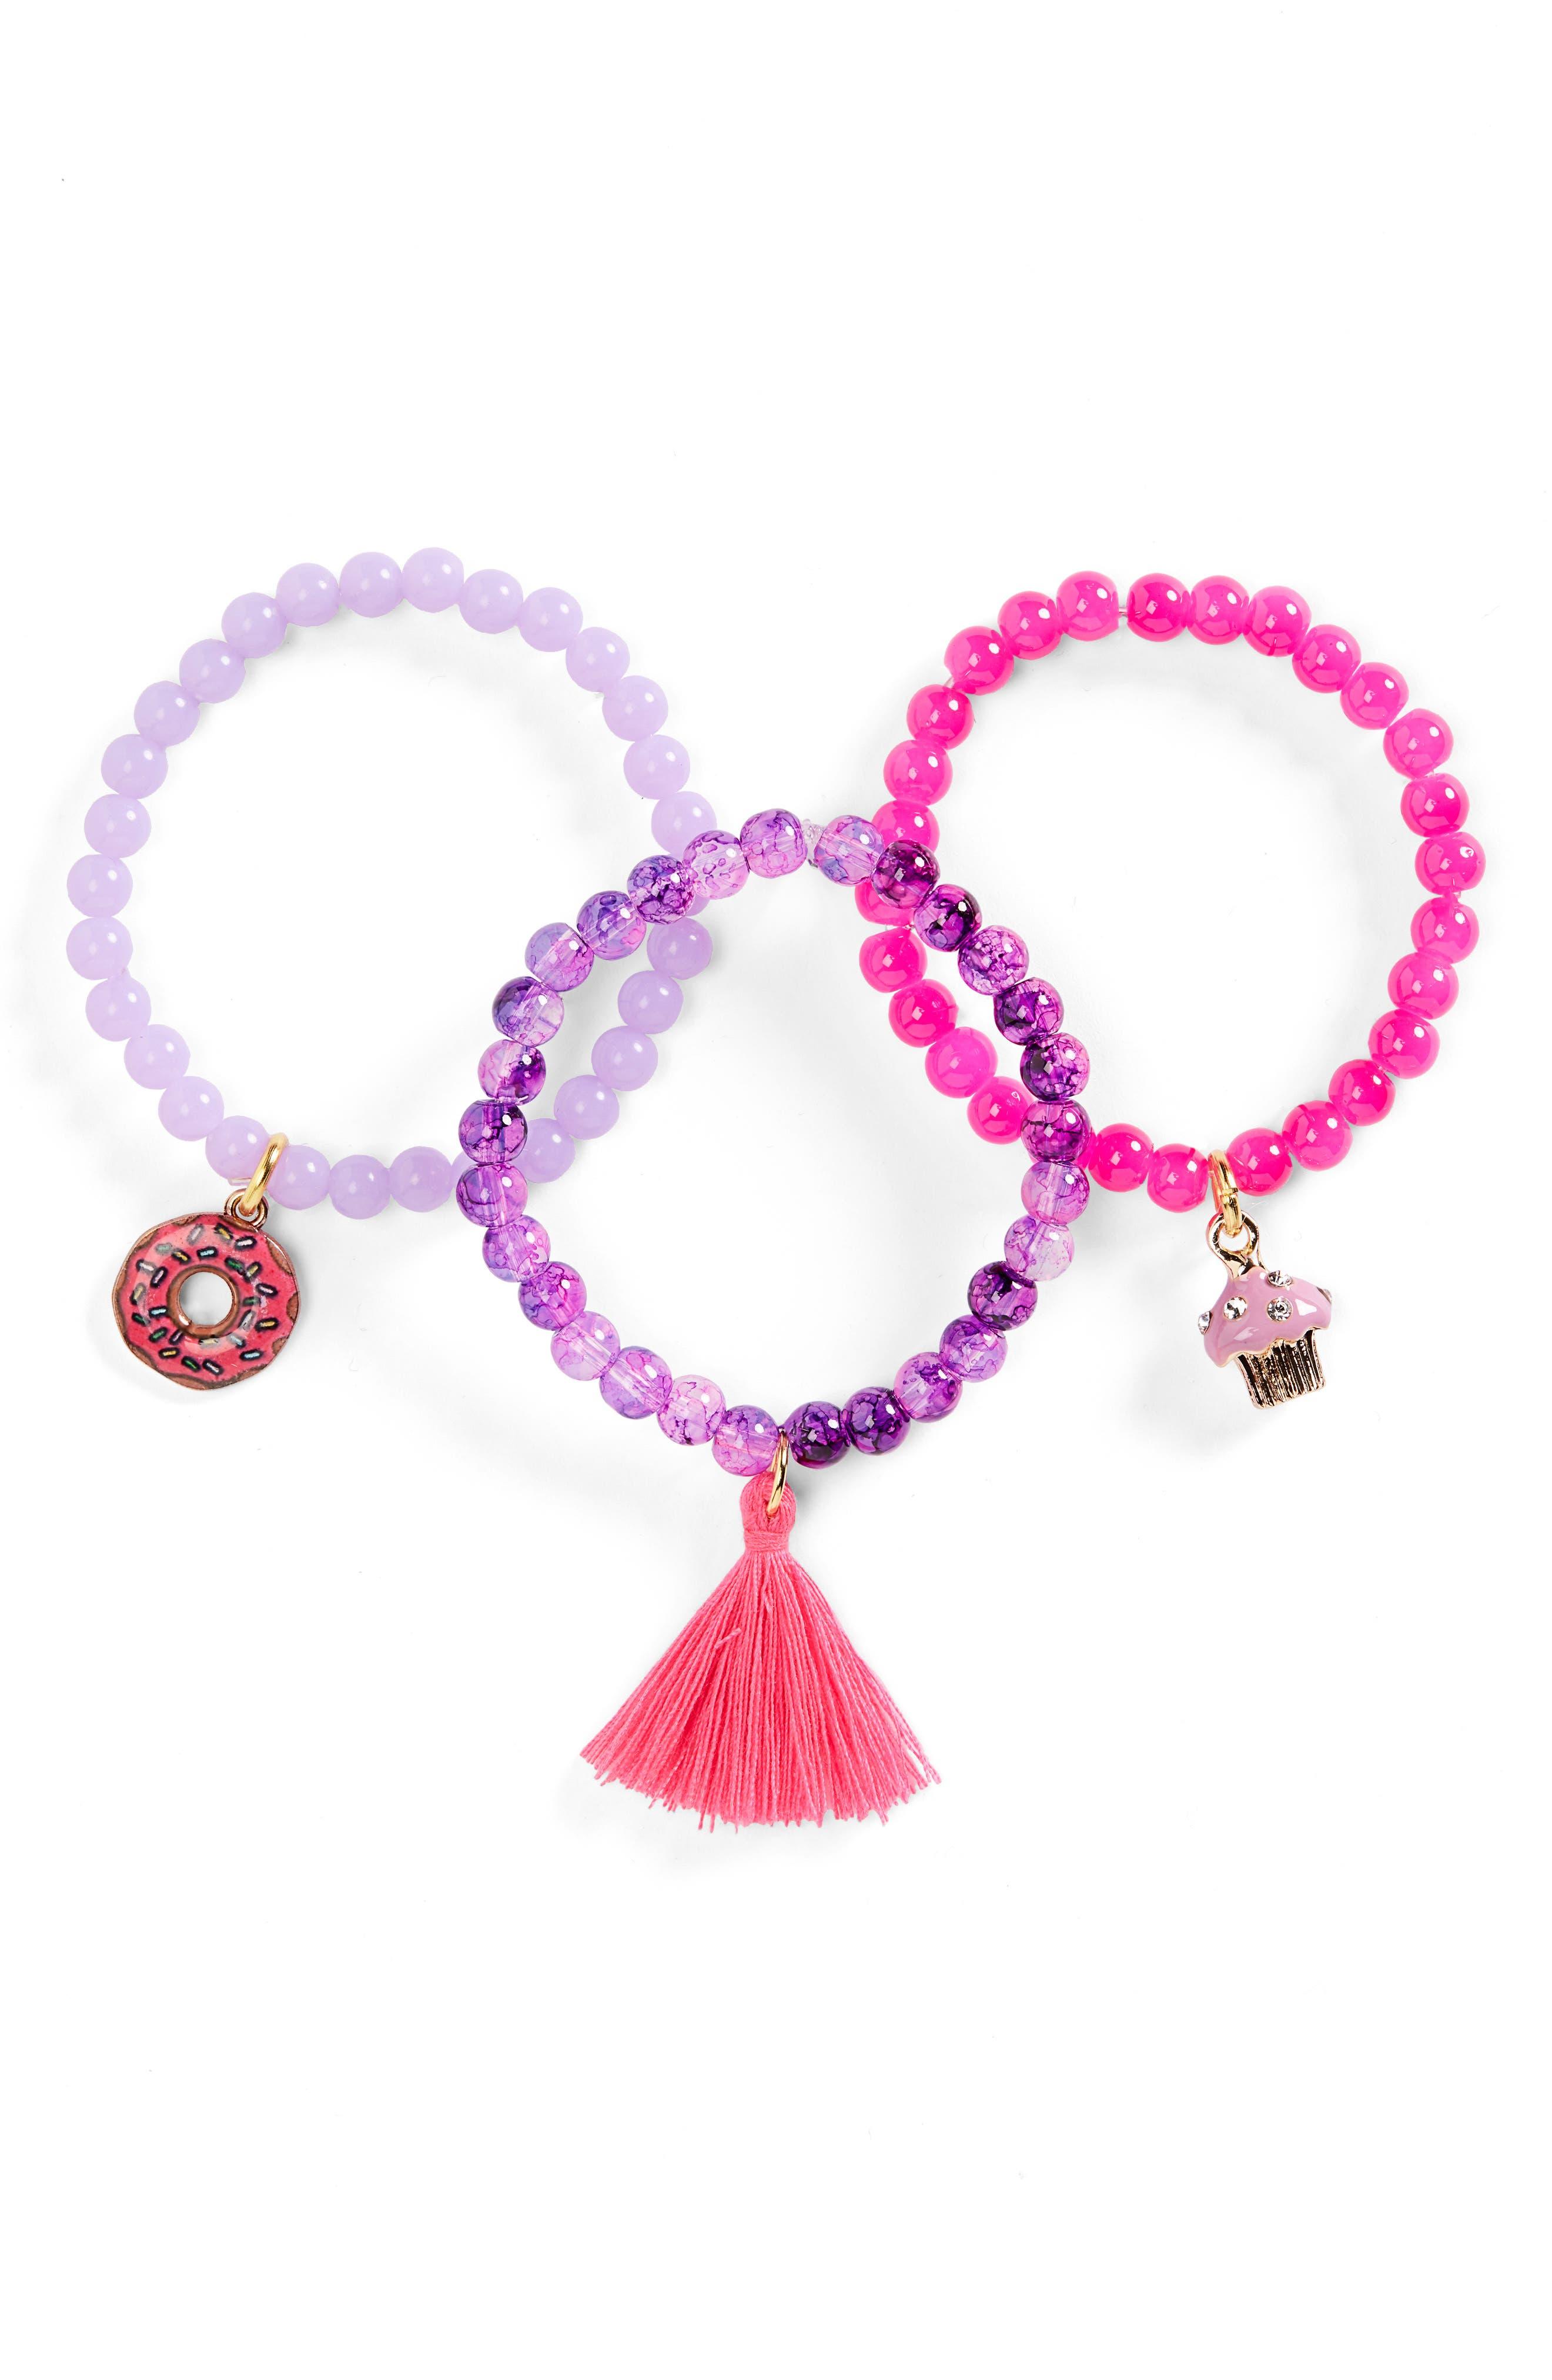 Girls Heart Me Set Of 3 Beaded Stretch Bracelets